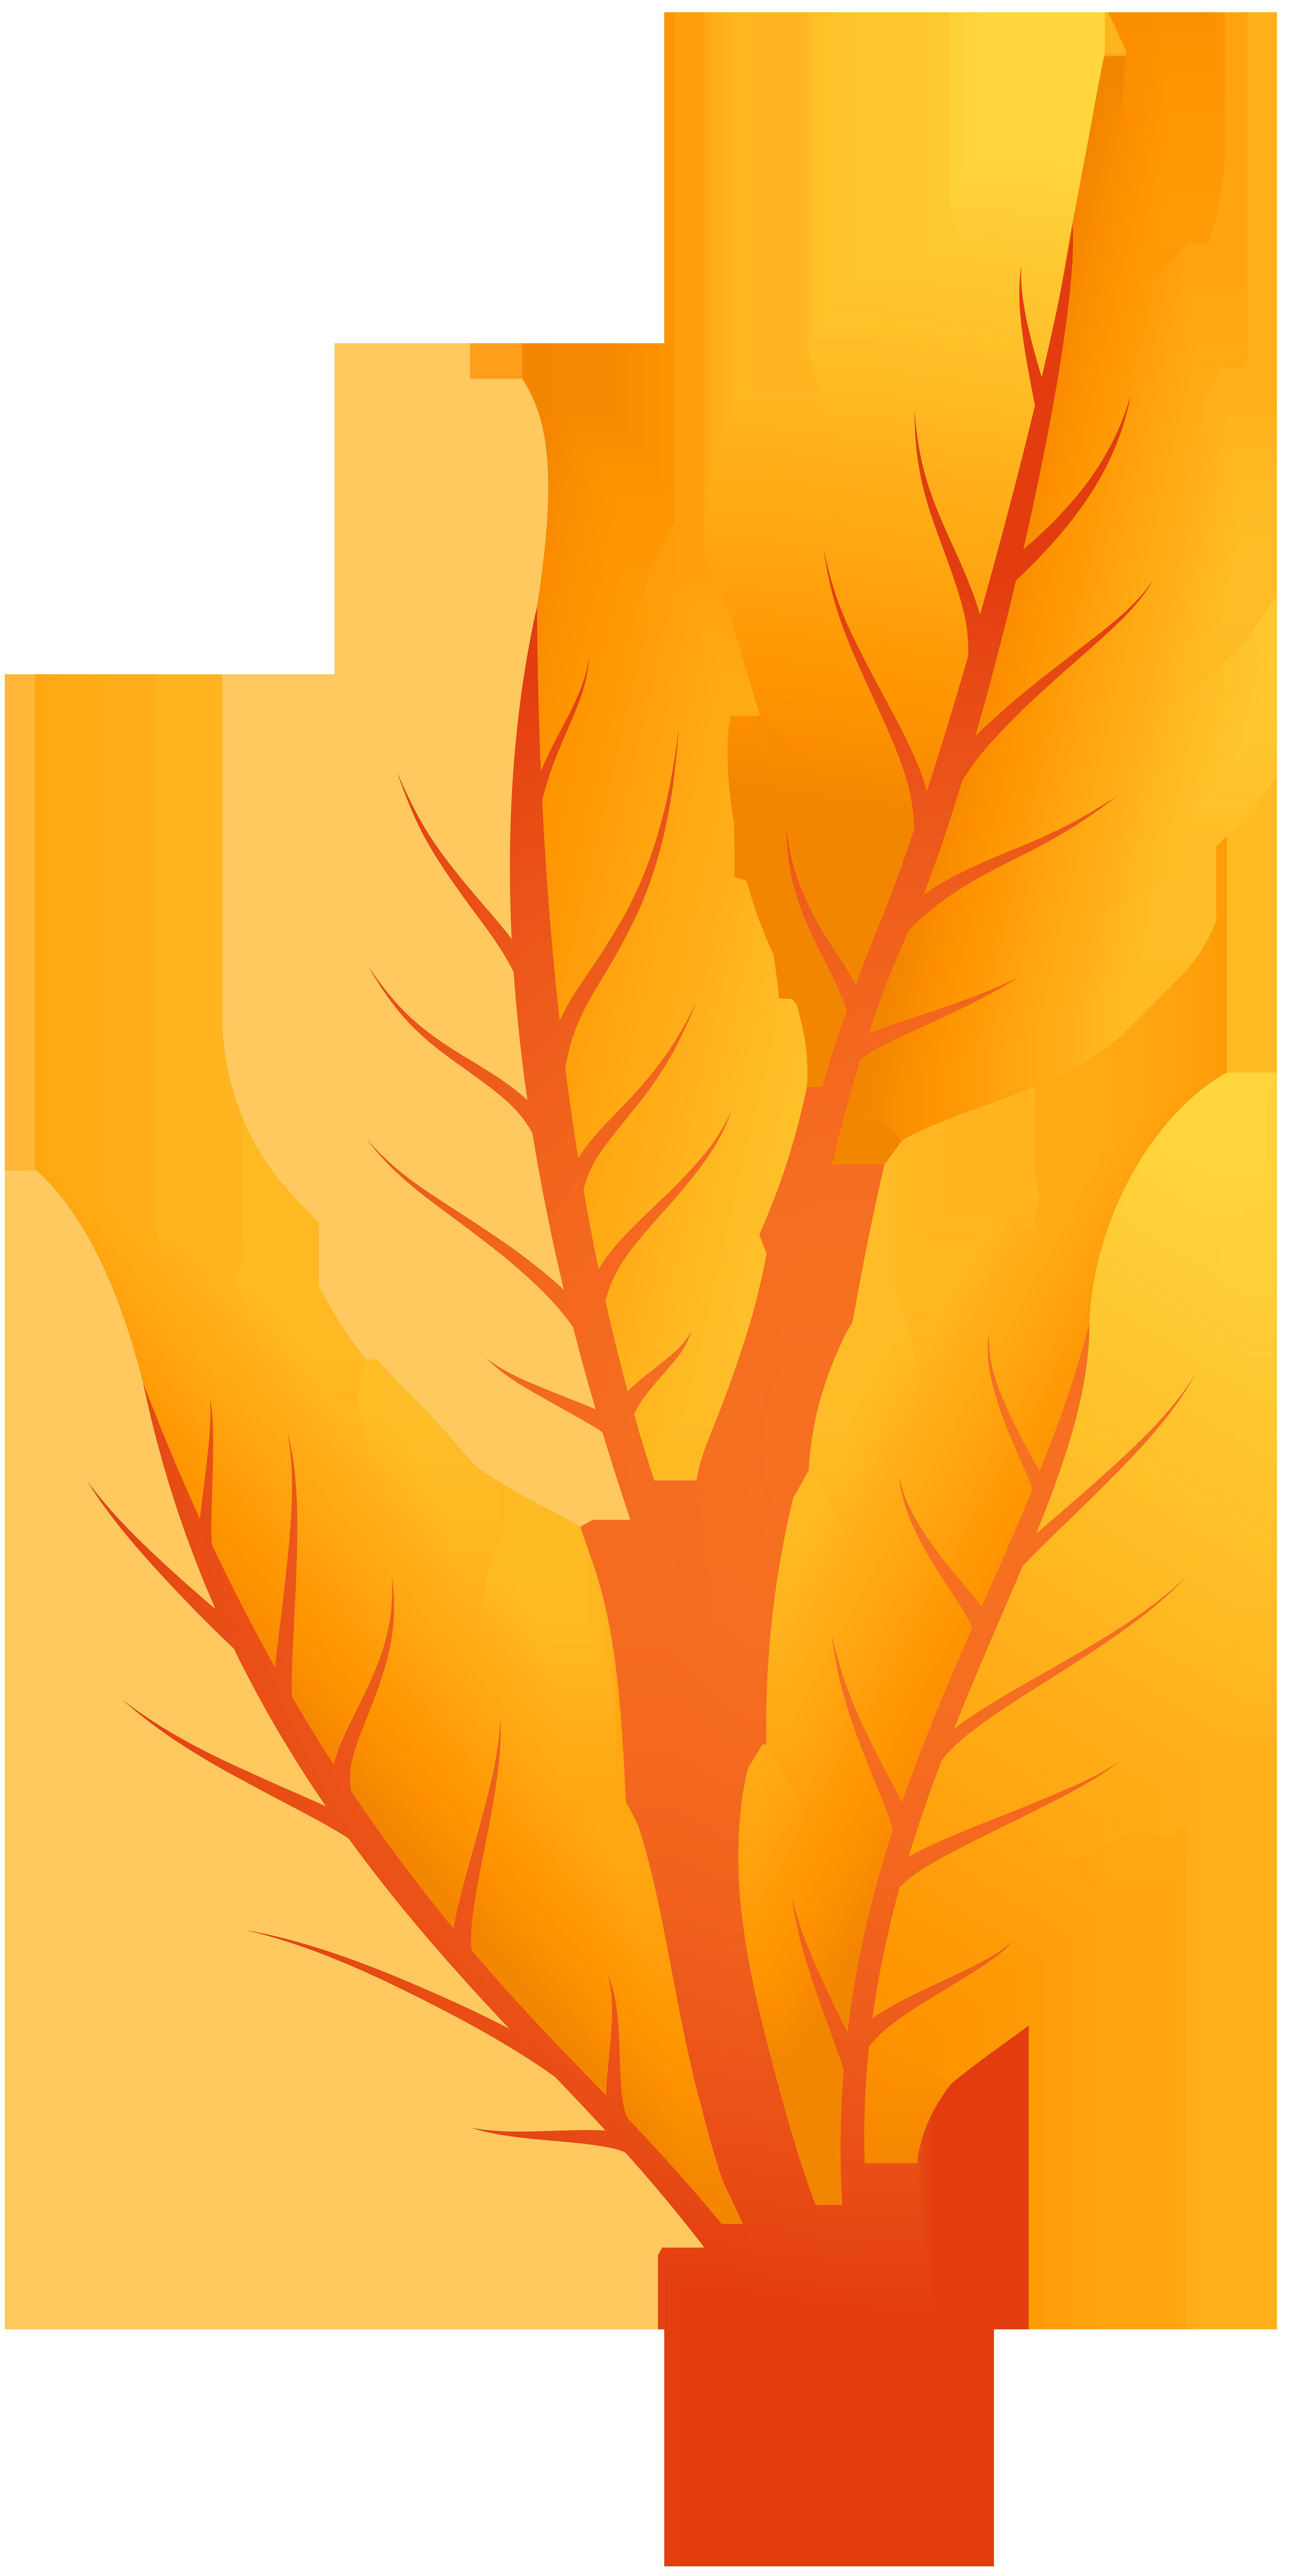 Dog clipart autumn. Orange leaves png clip